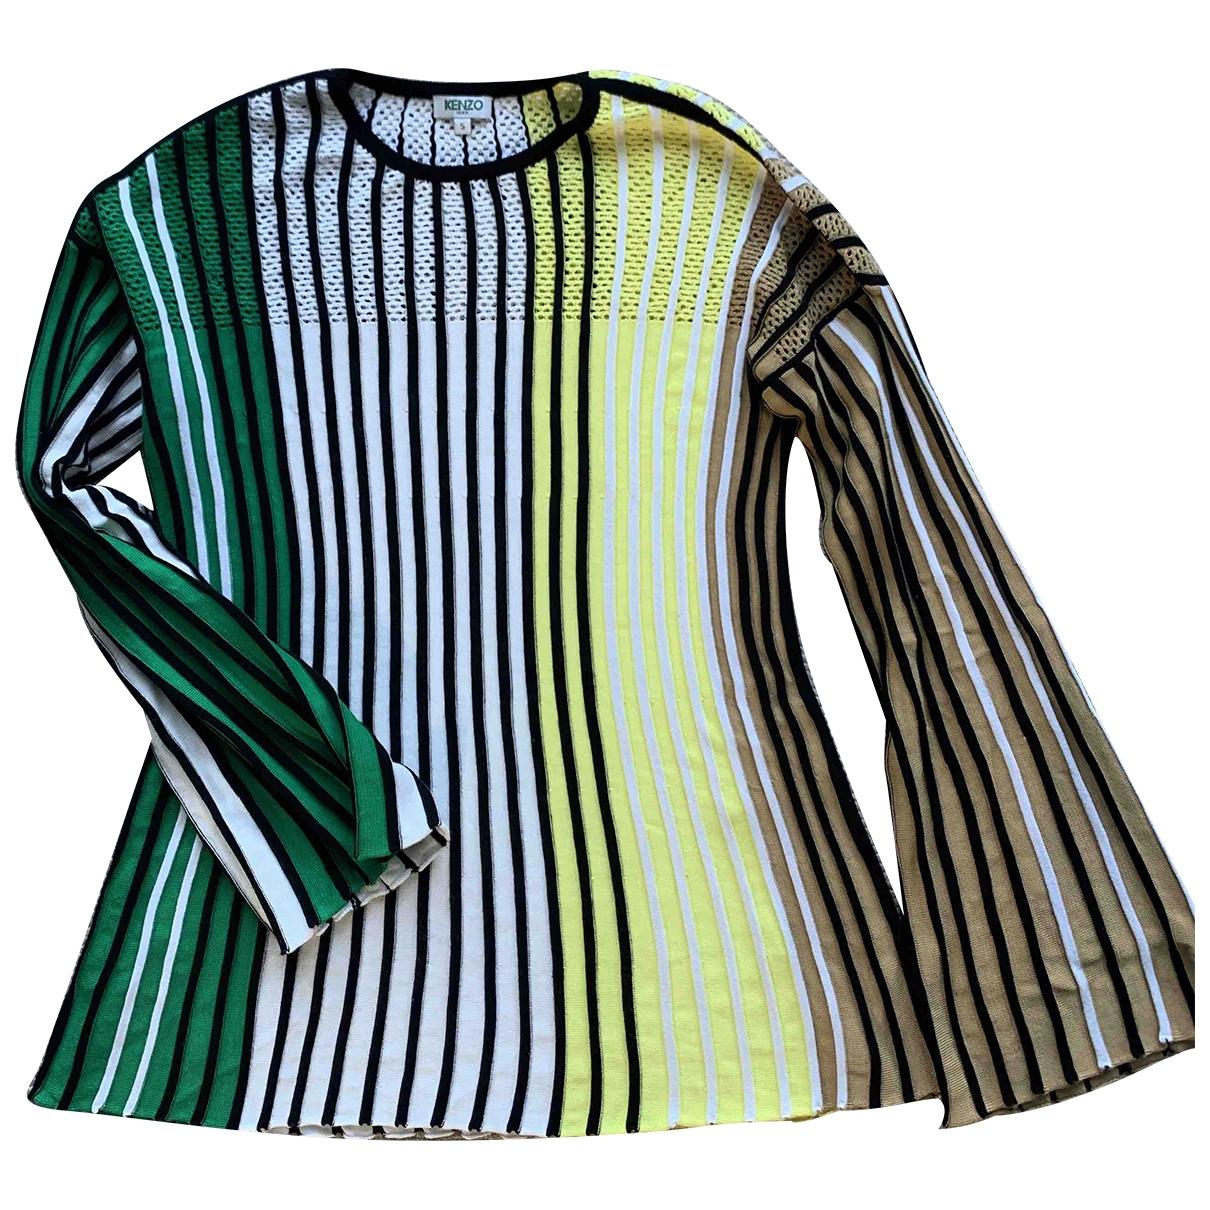 Kenzo - Pull   pour femme - multicolore